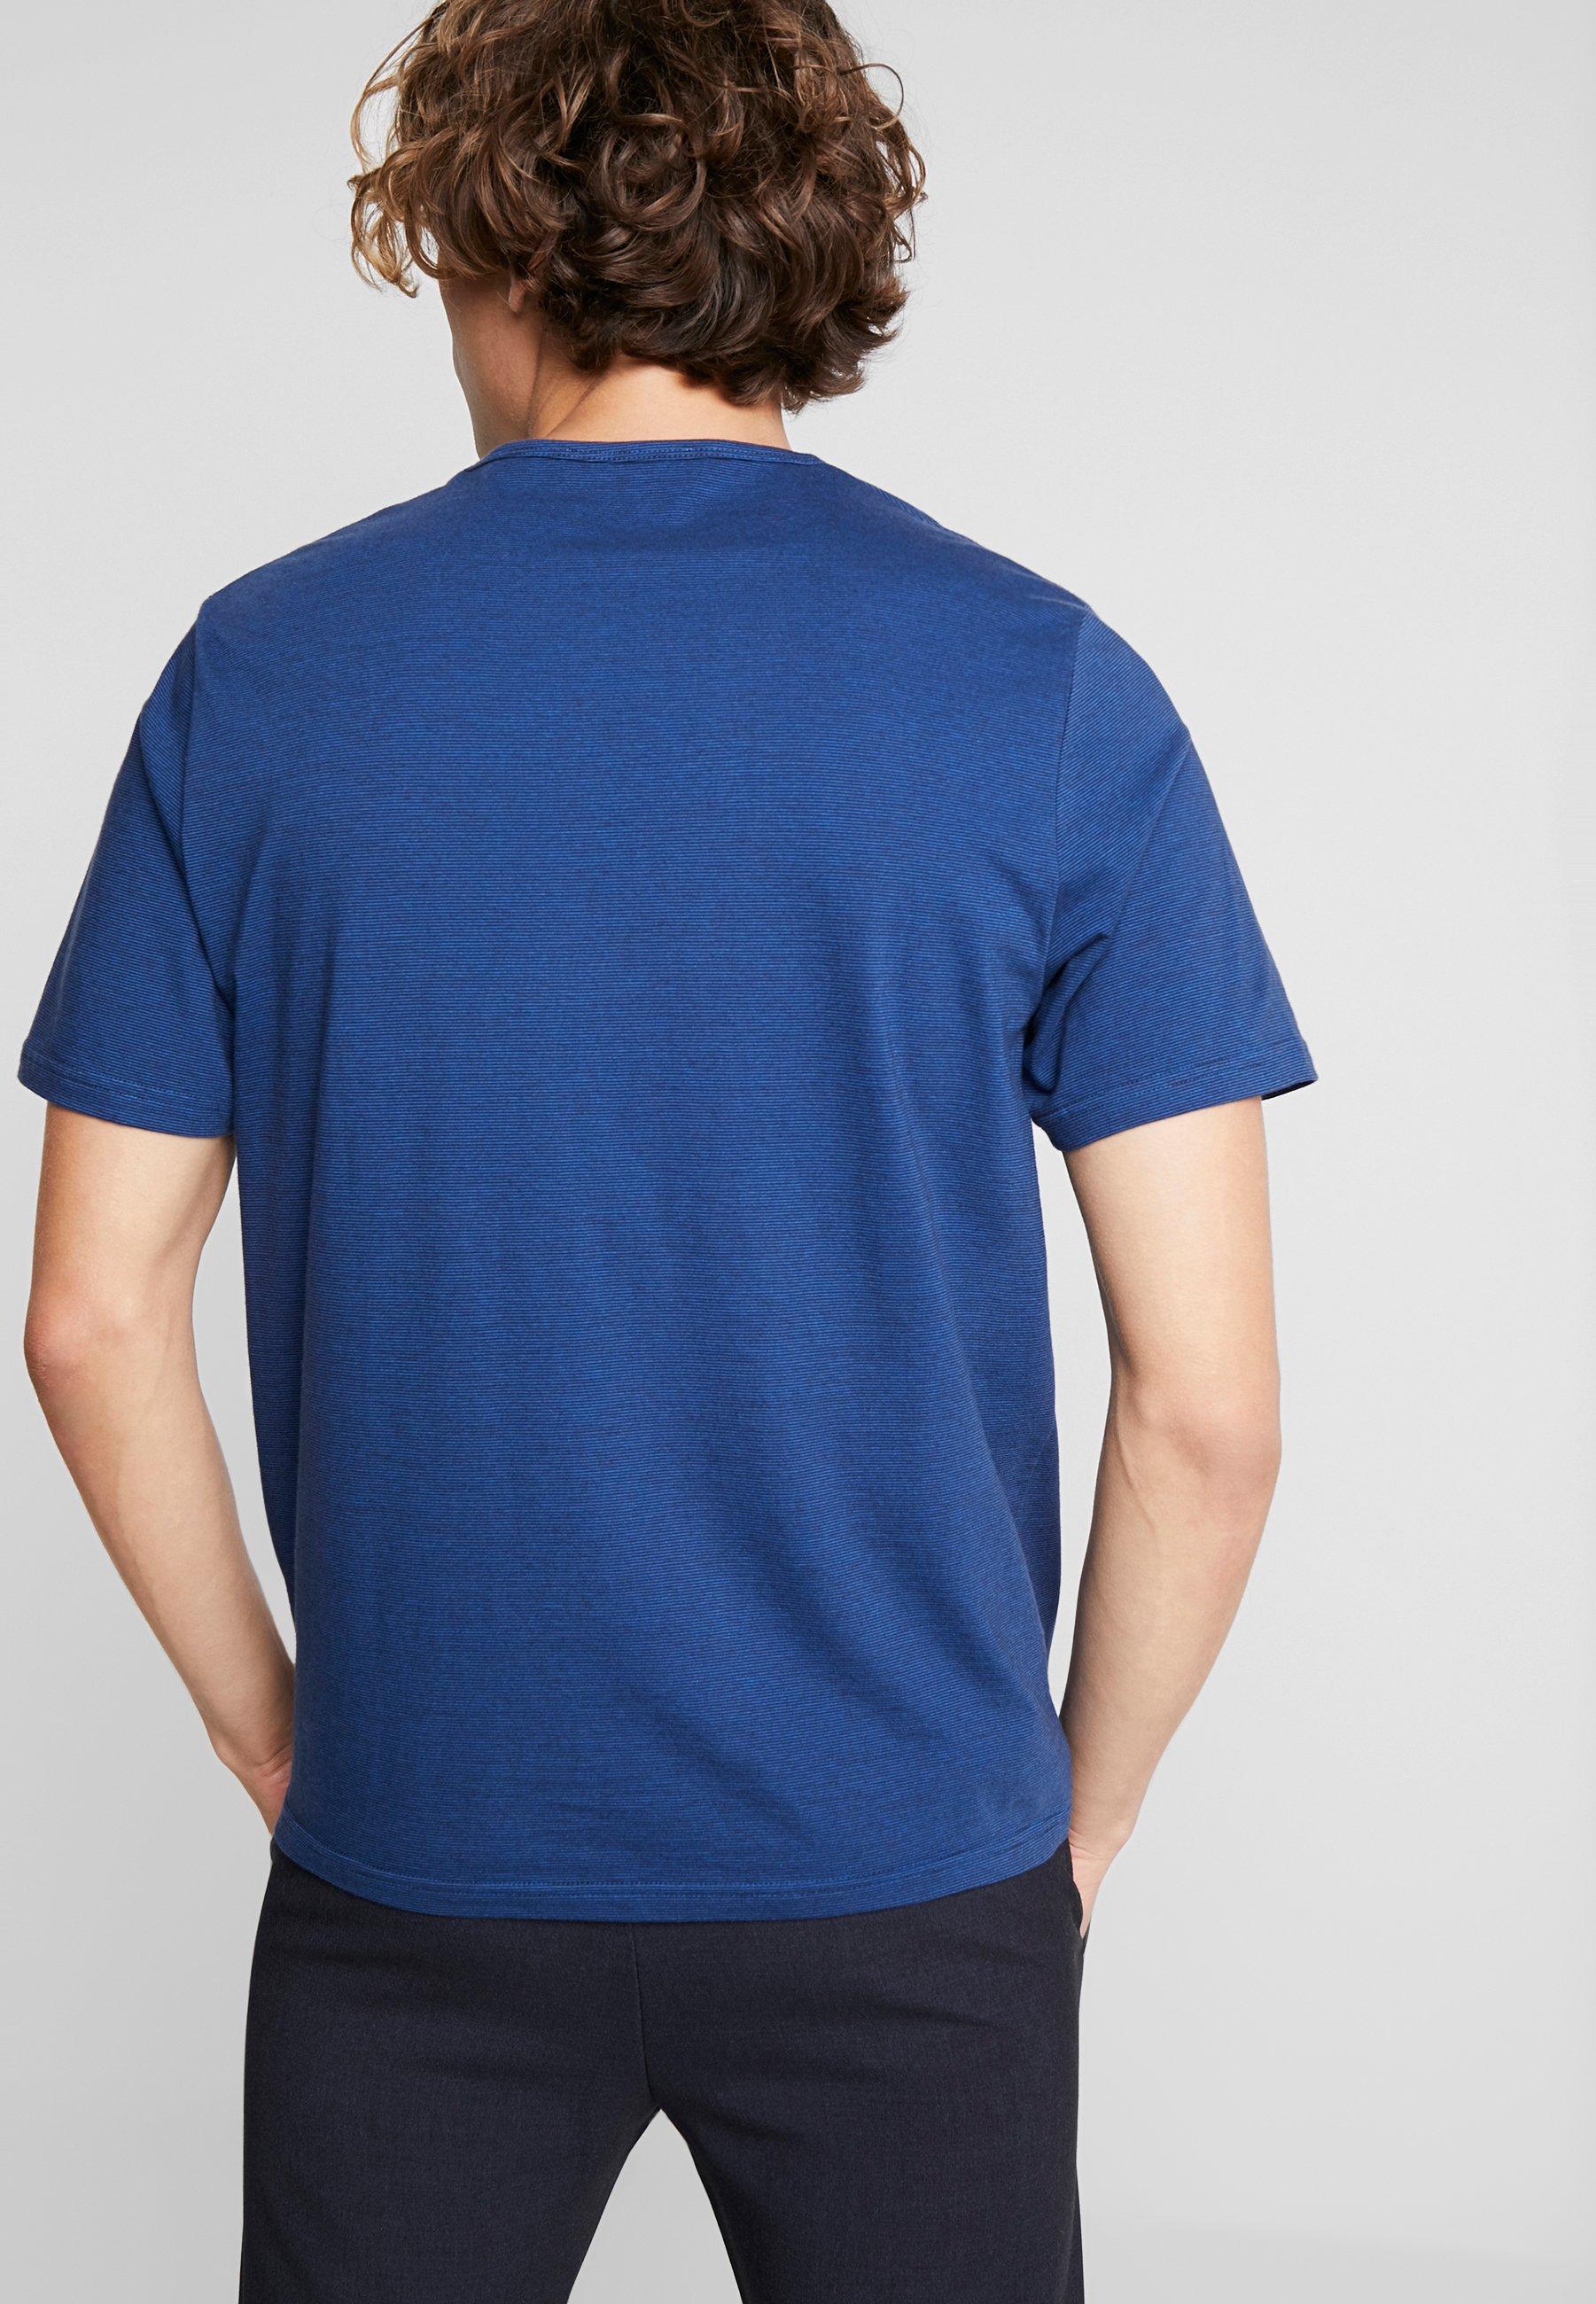 Sky Imprimé FinnT Samsøeamp; shirt Classic gf7b6y